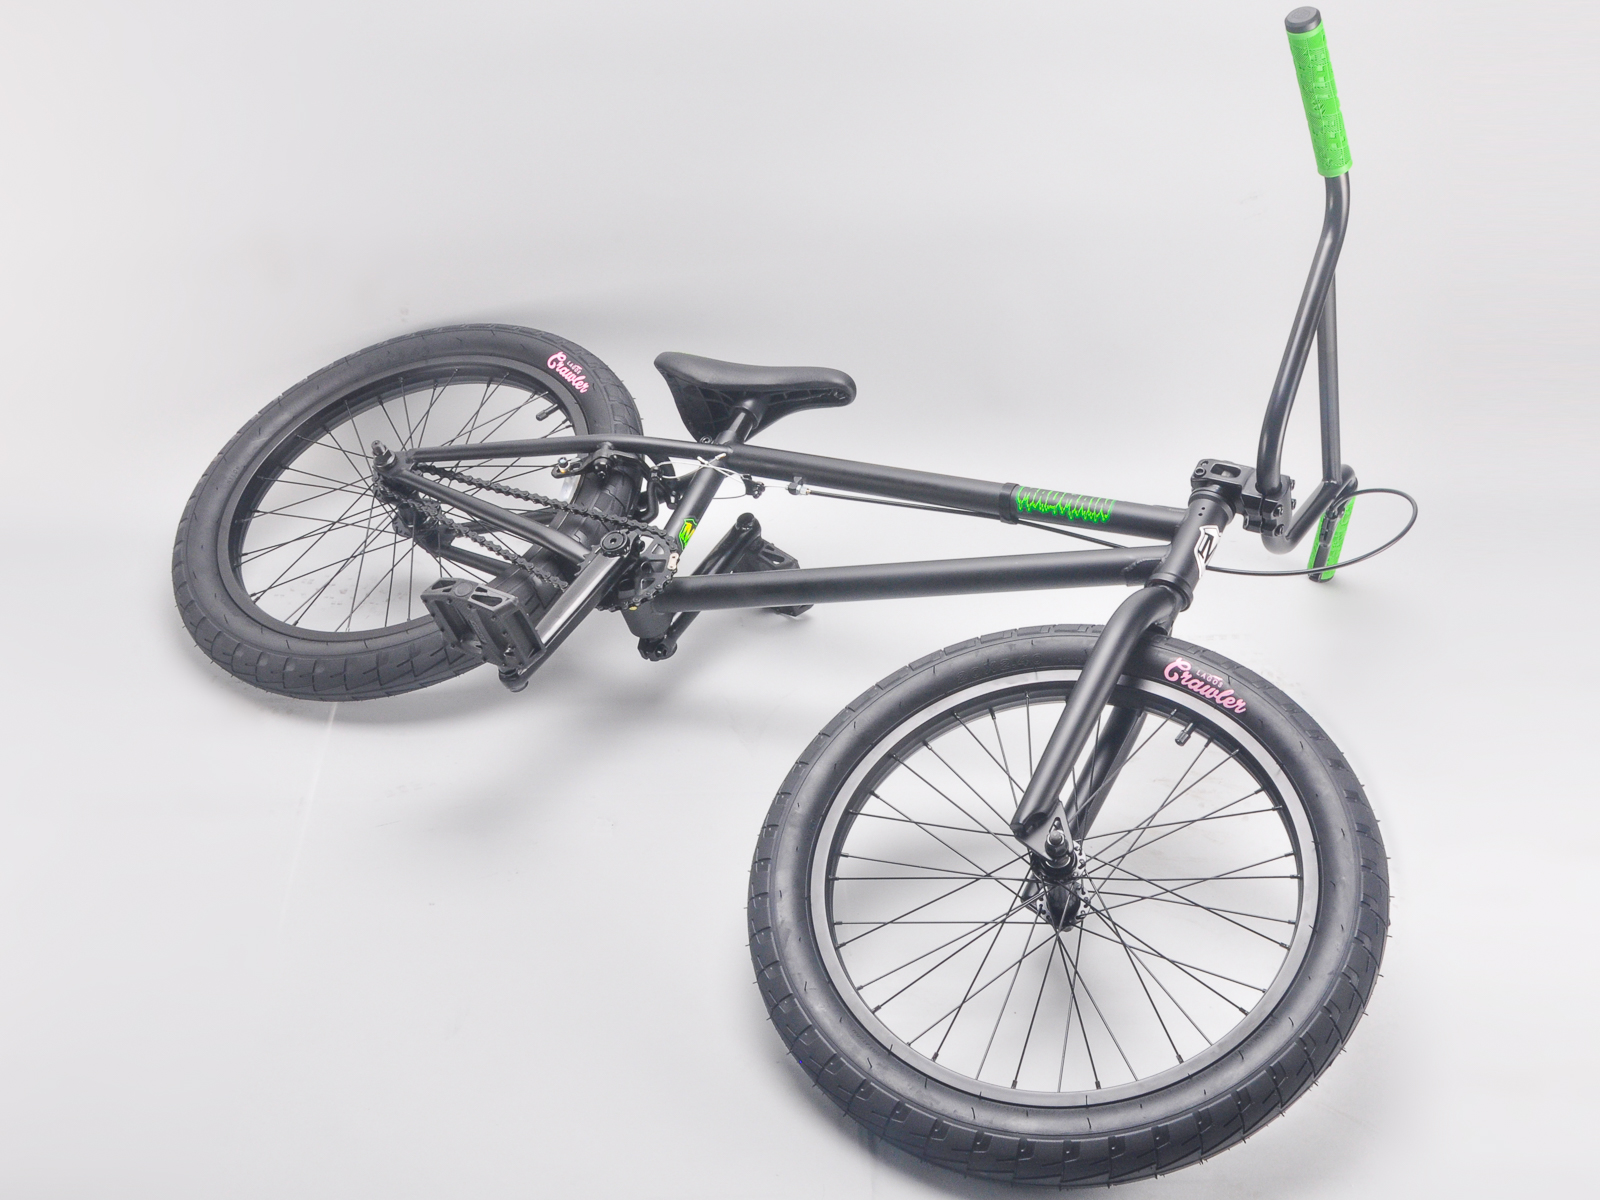 20 zoll mafiabikes bmx bike madmain verschiedene. Black Bedroom Furniture Sets. Home Design Ideas